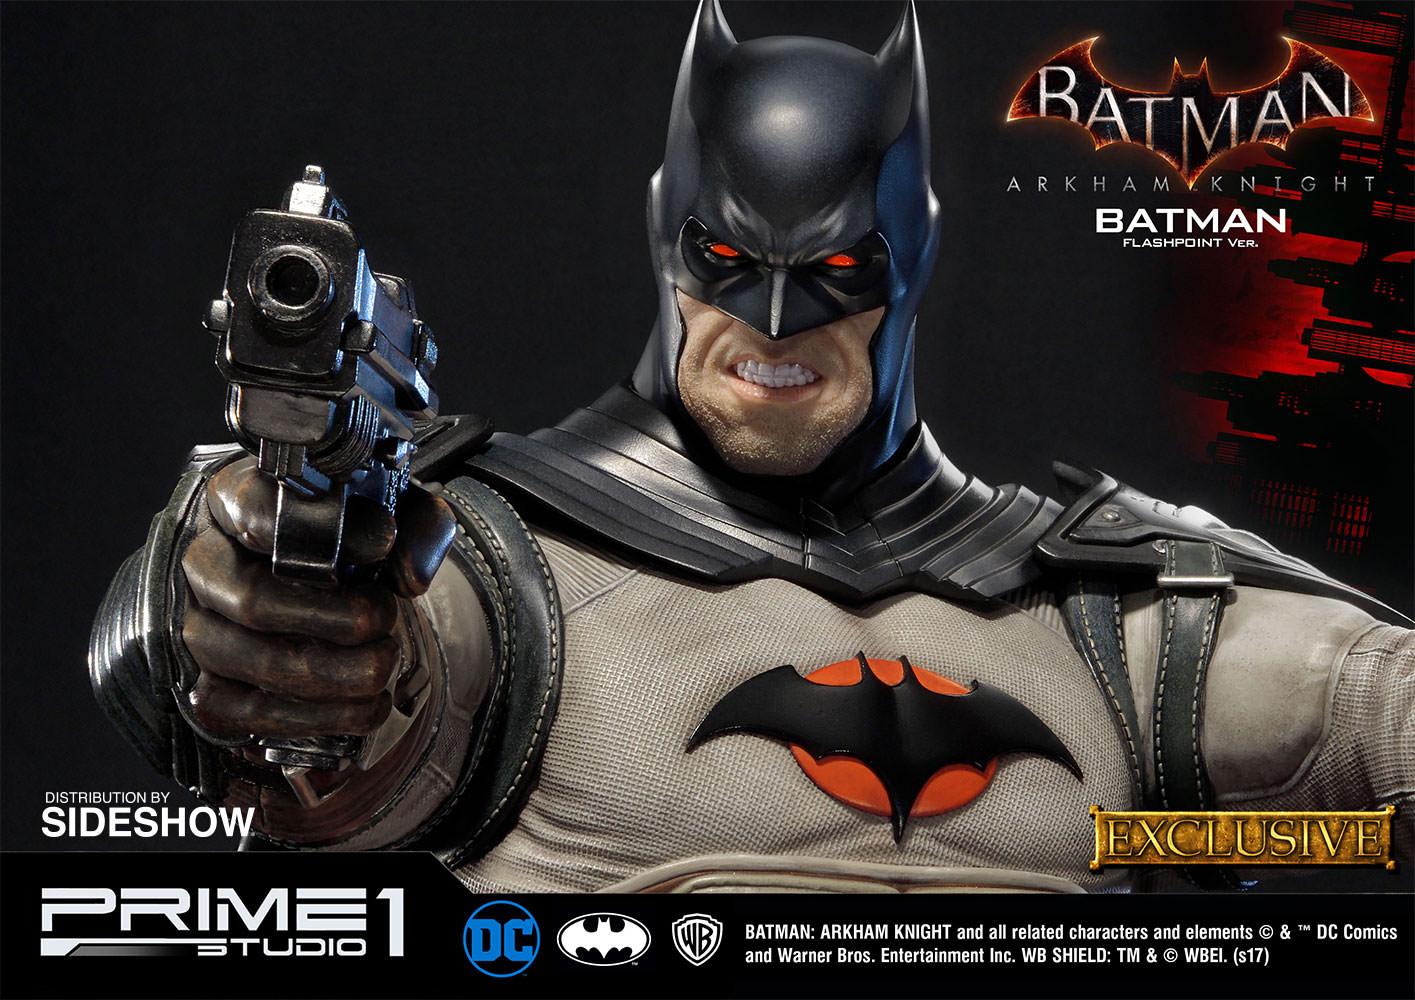 batman arkham knight flashpoint version batman statue